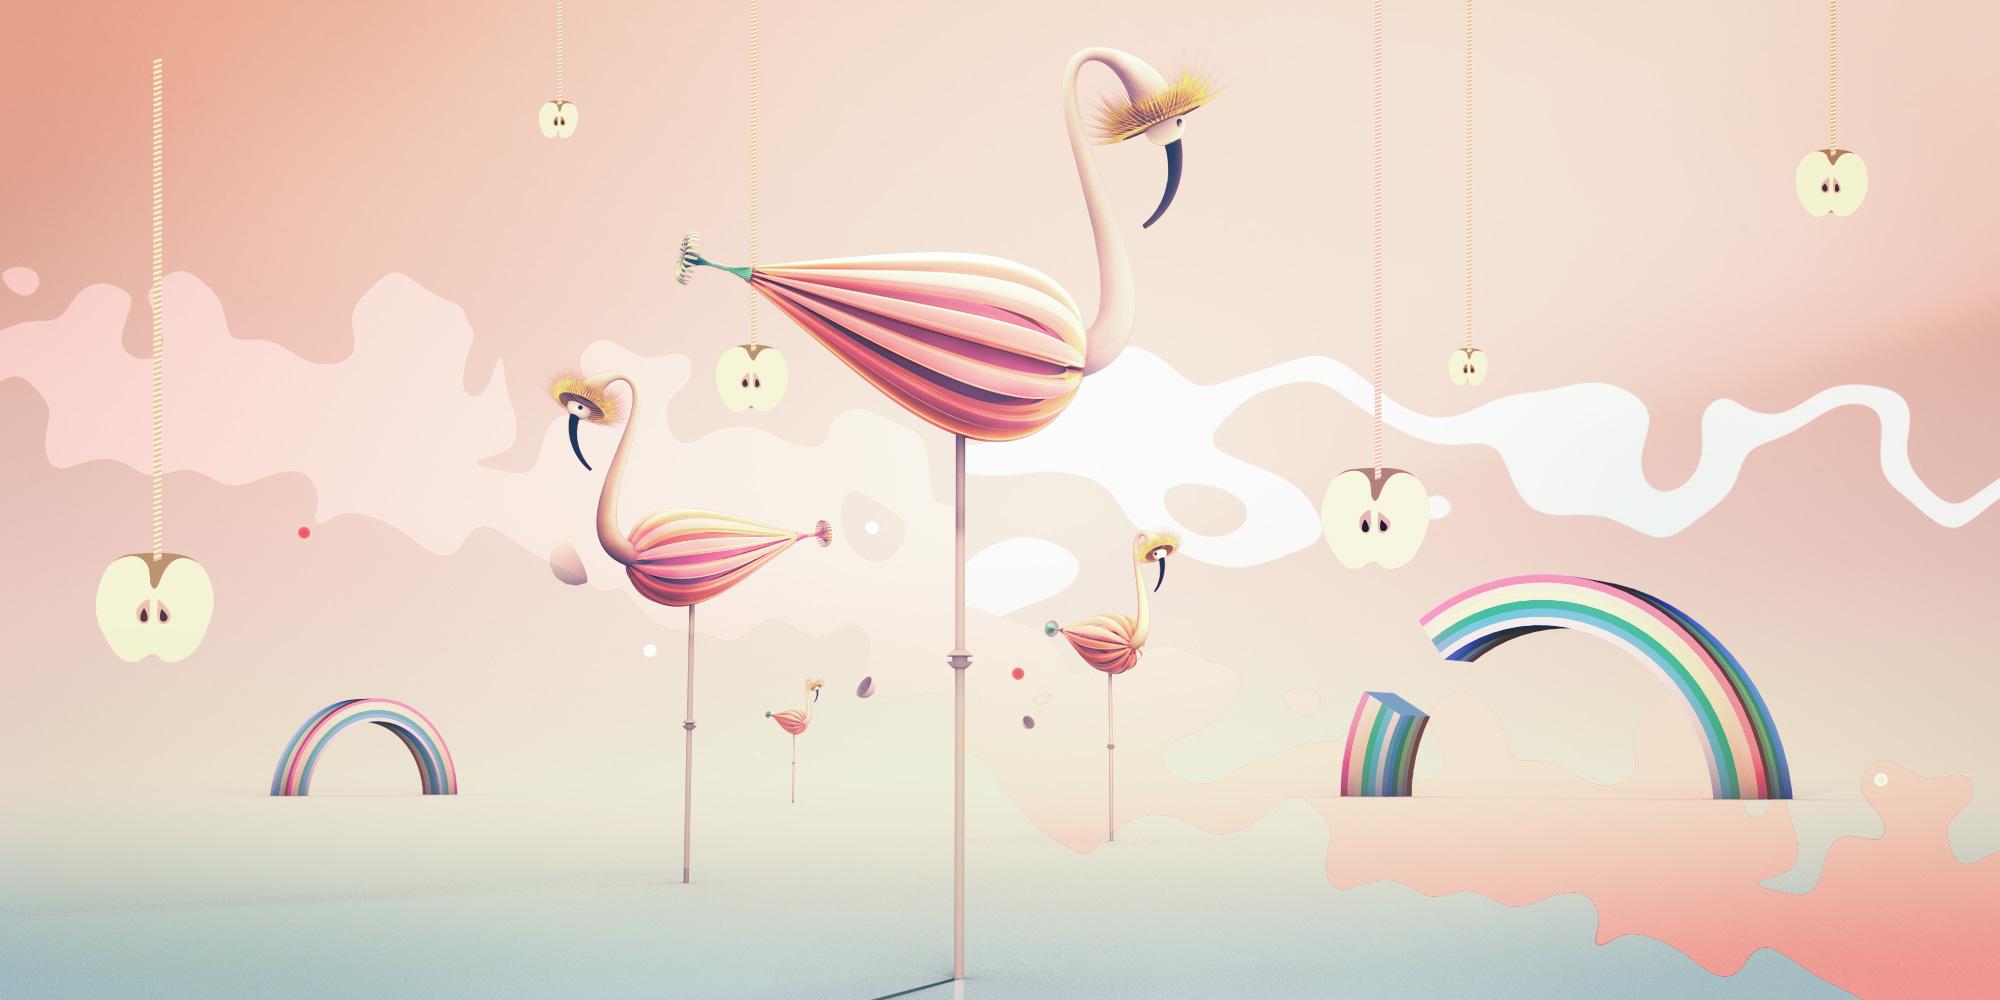 flamingo_7